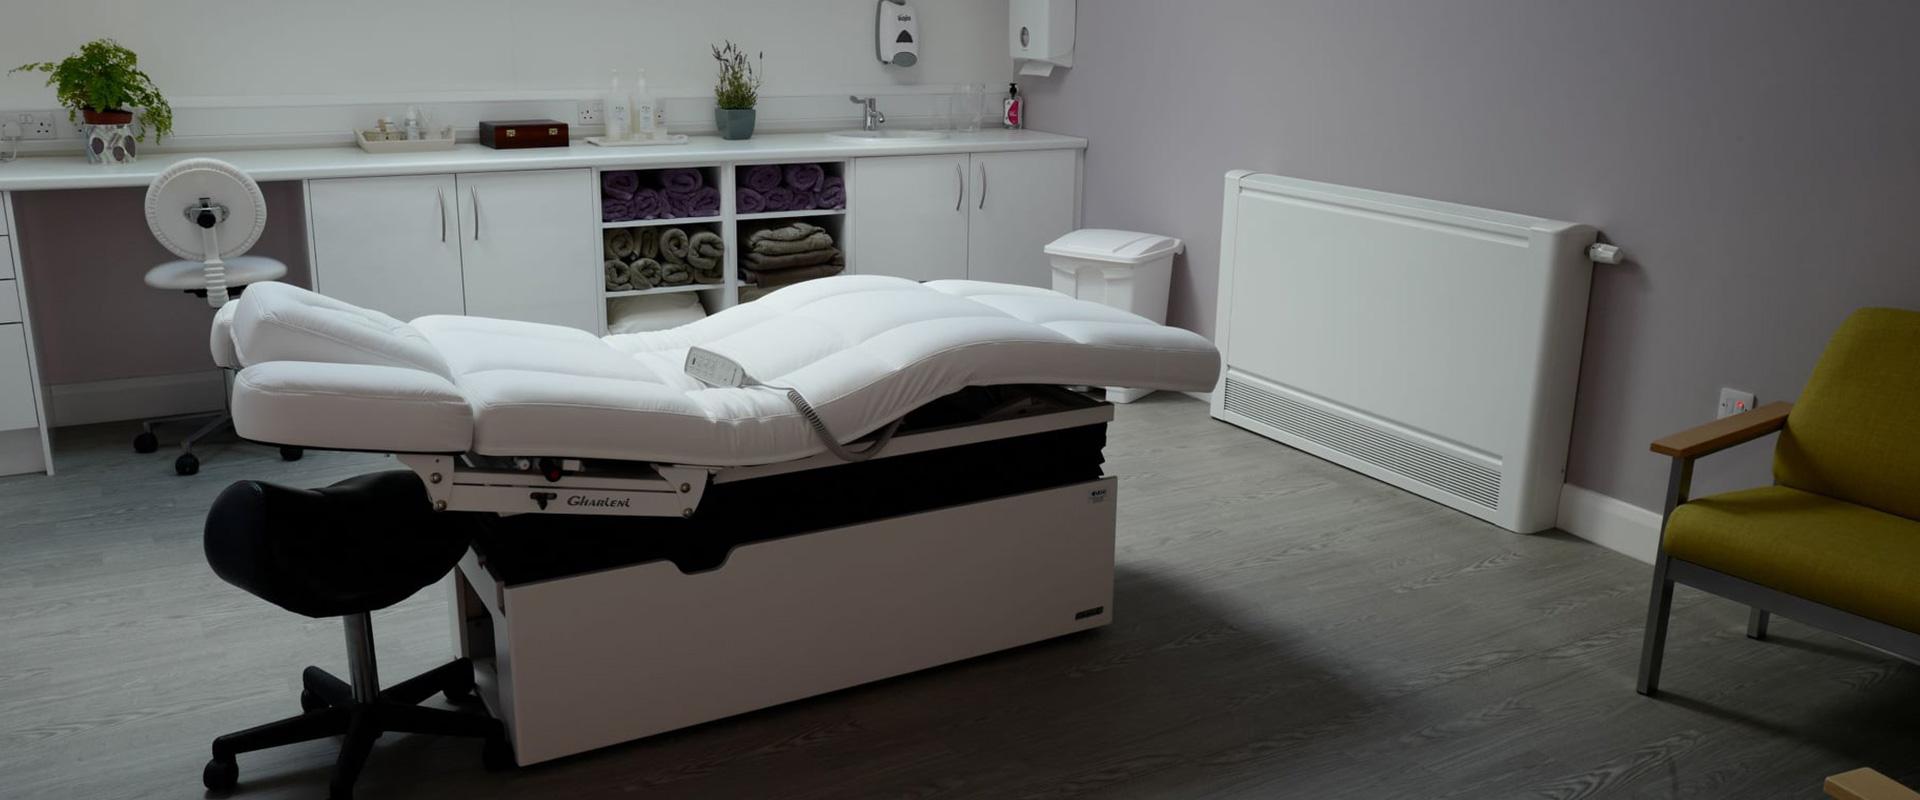 blog-helping-the-isle-of-man-hospice-team1920x01